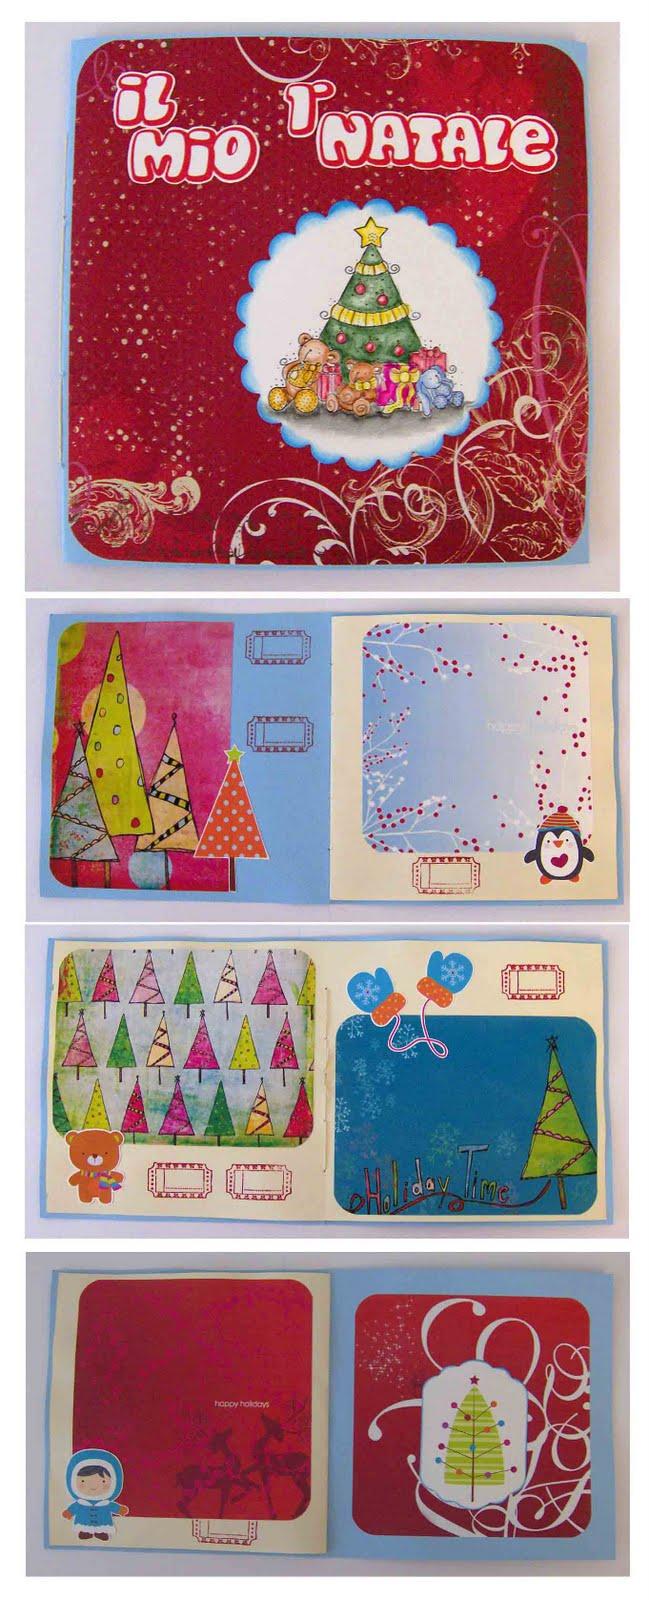 Dipingere Sassi Per Natale carta e sassi: l'album per simone